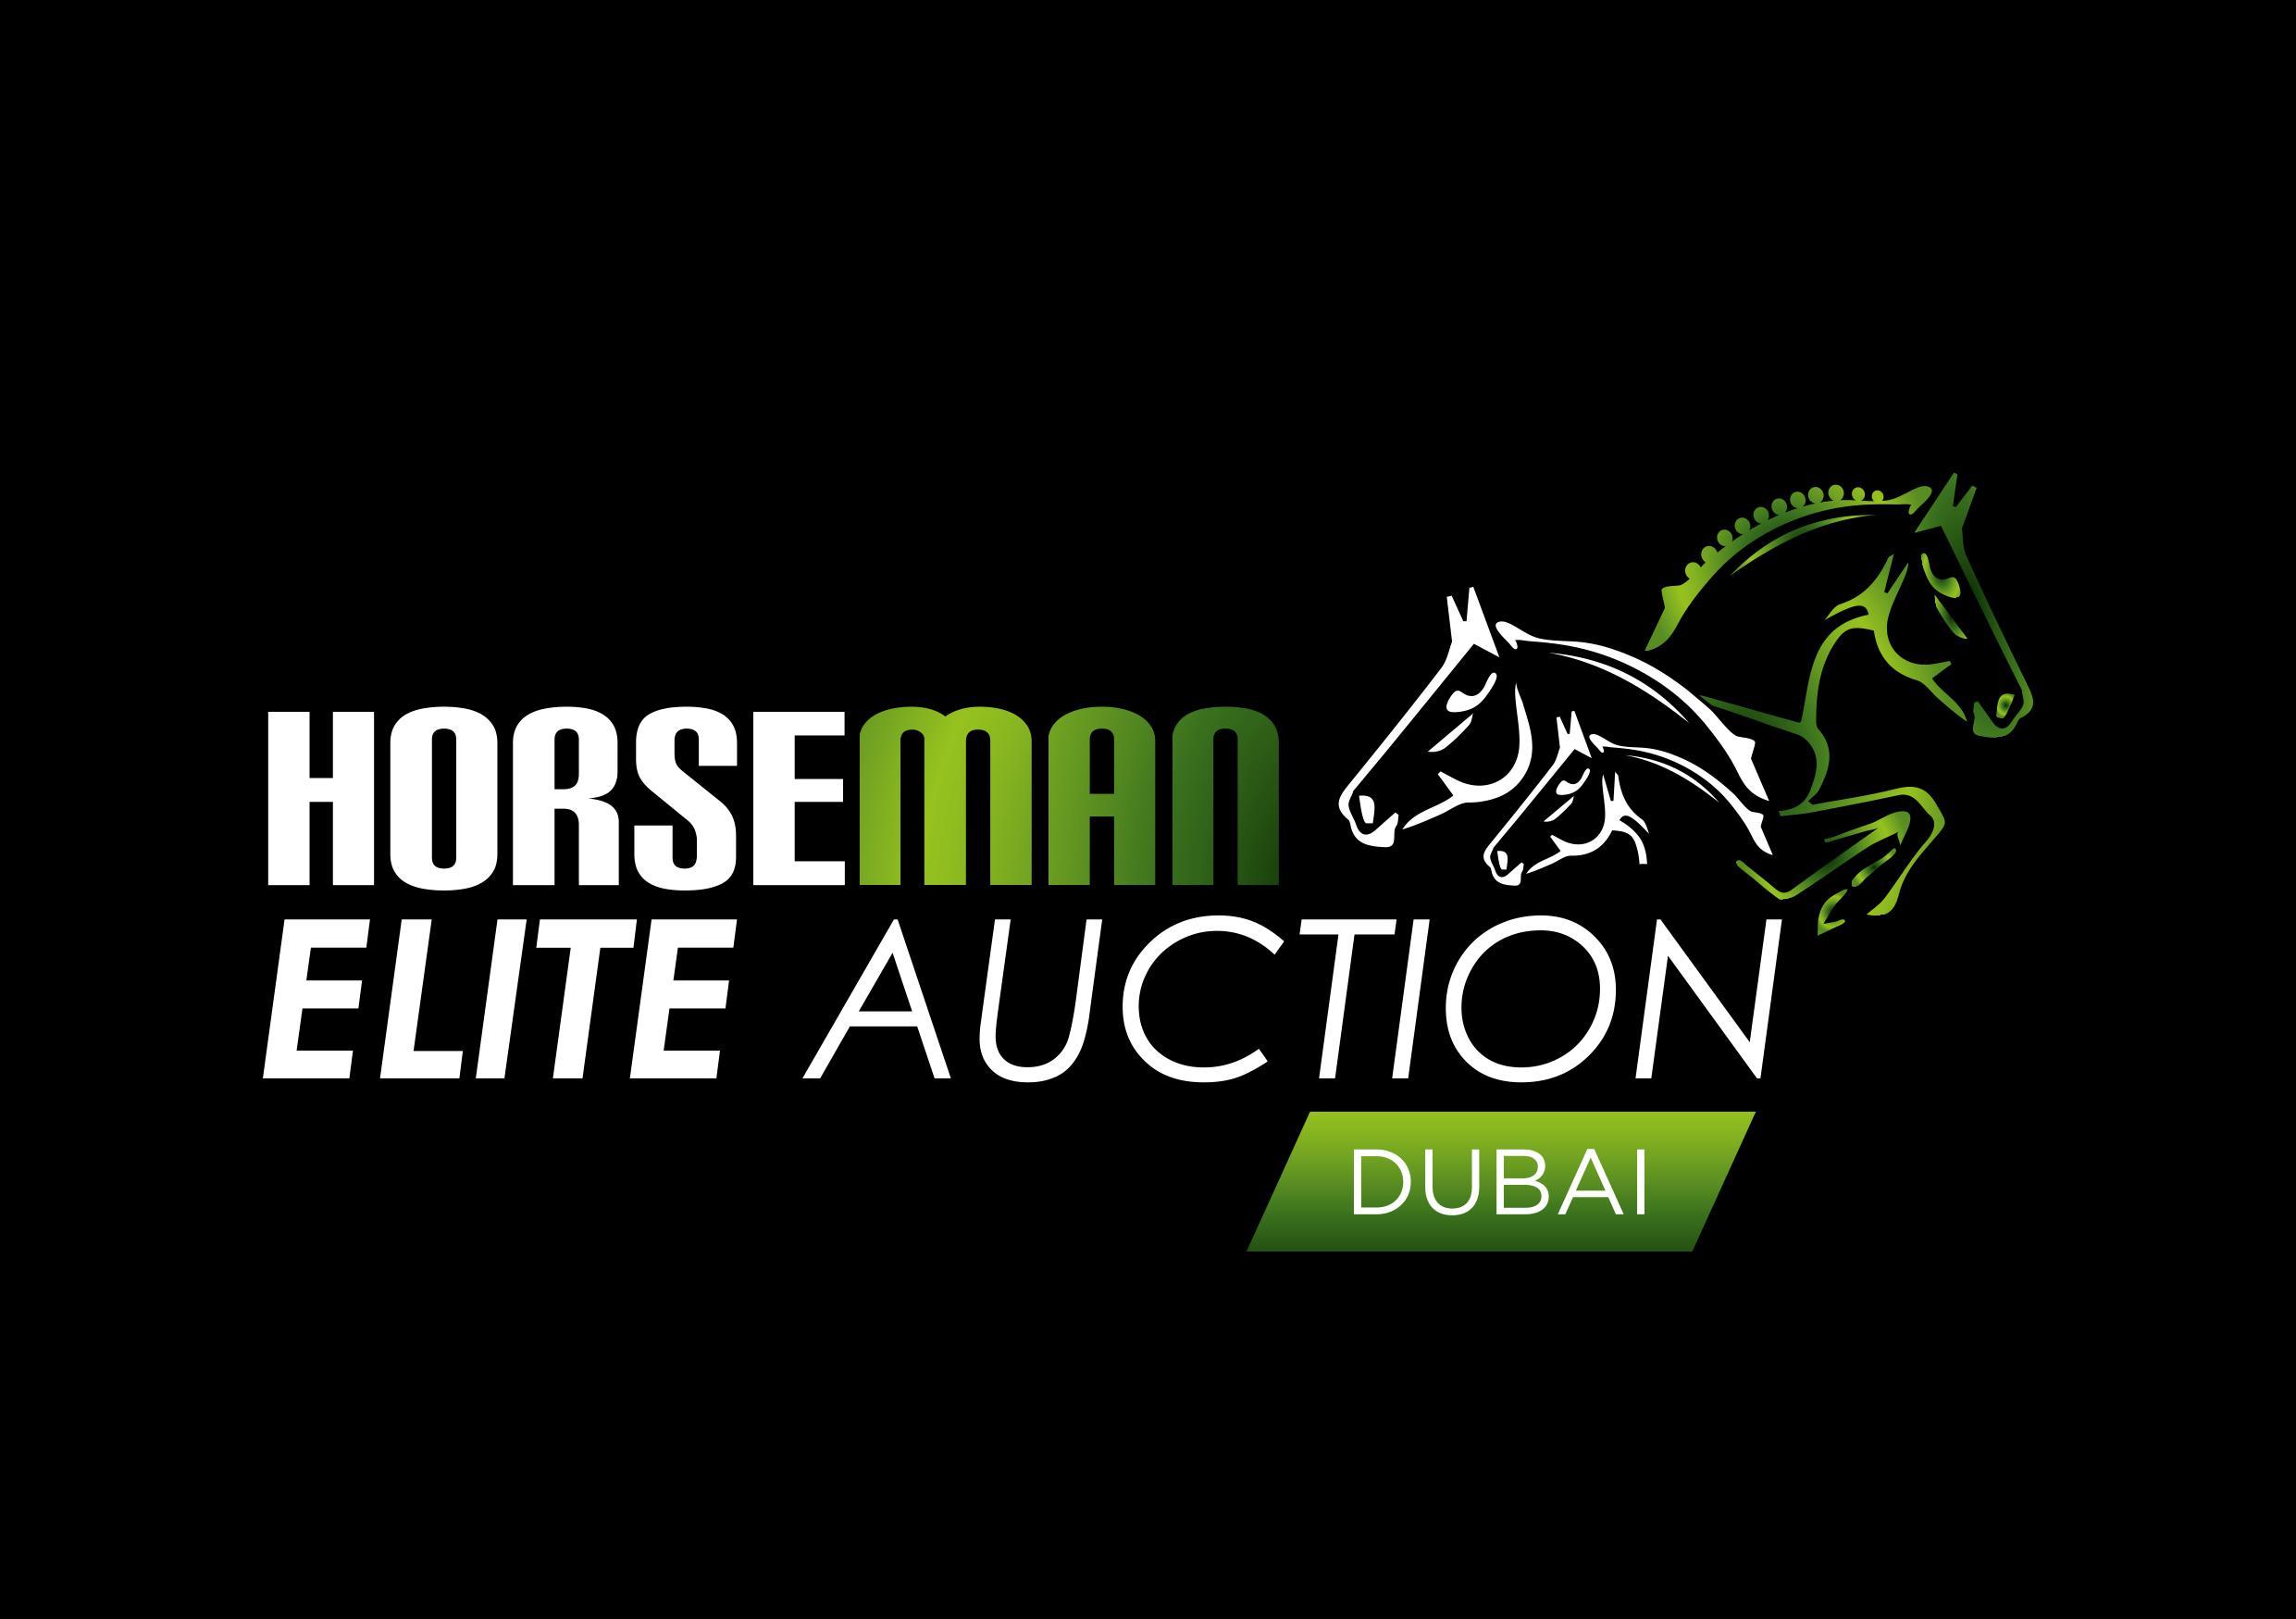 Horseman Elite Auction DUBAI